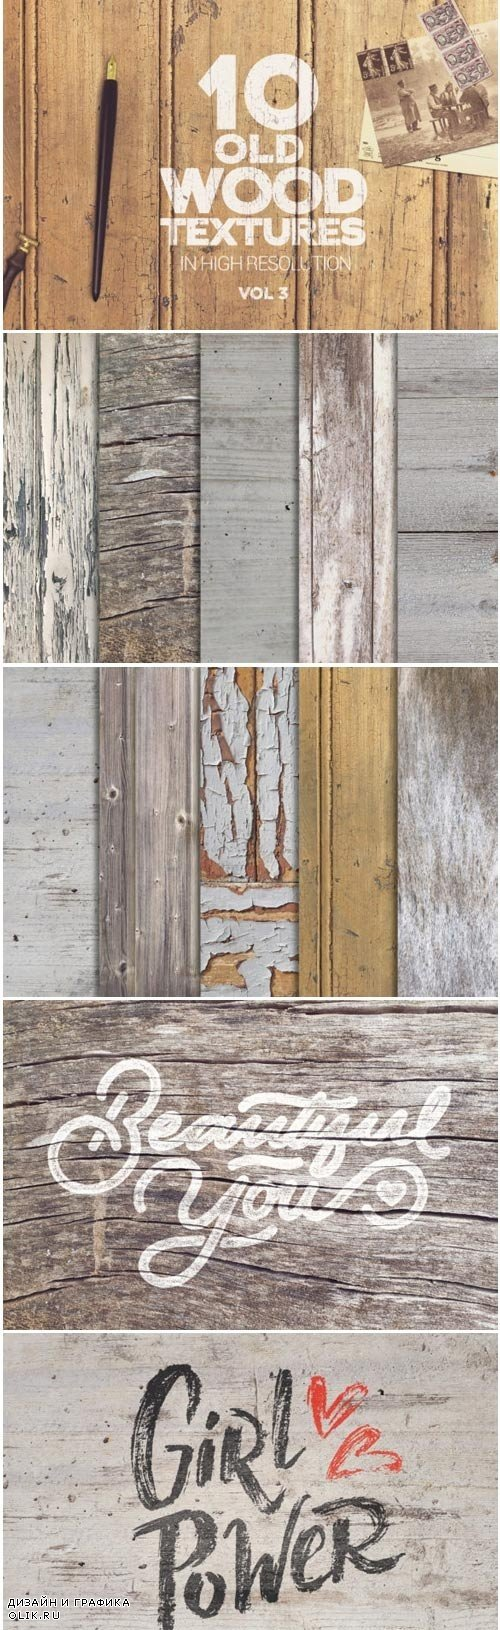 Old Wood Textures Vol 3 x10 - 3976429